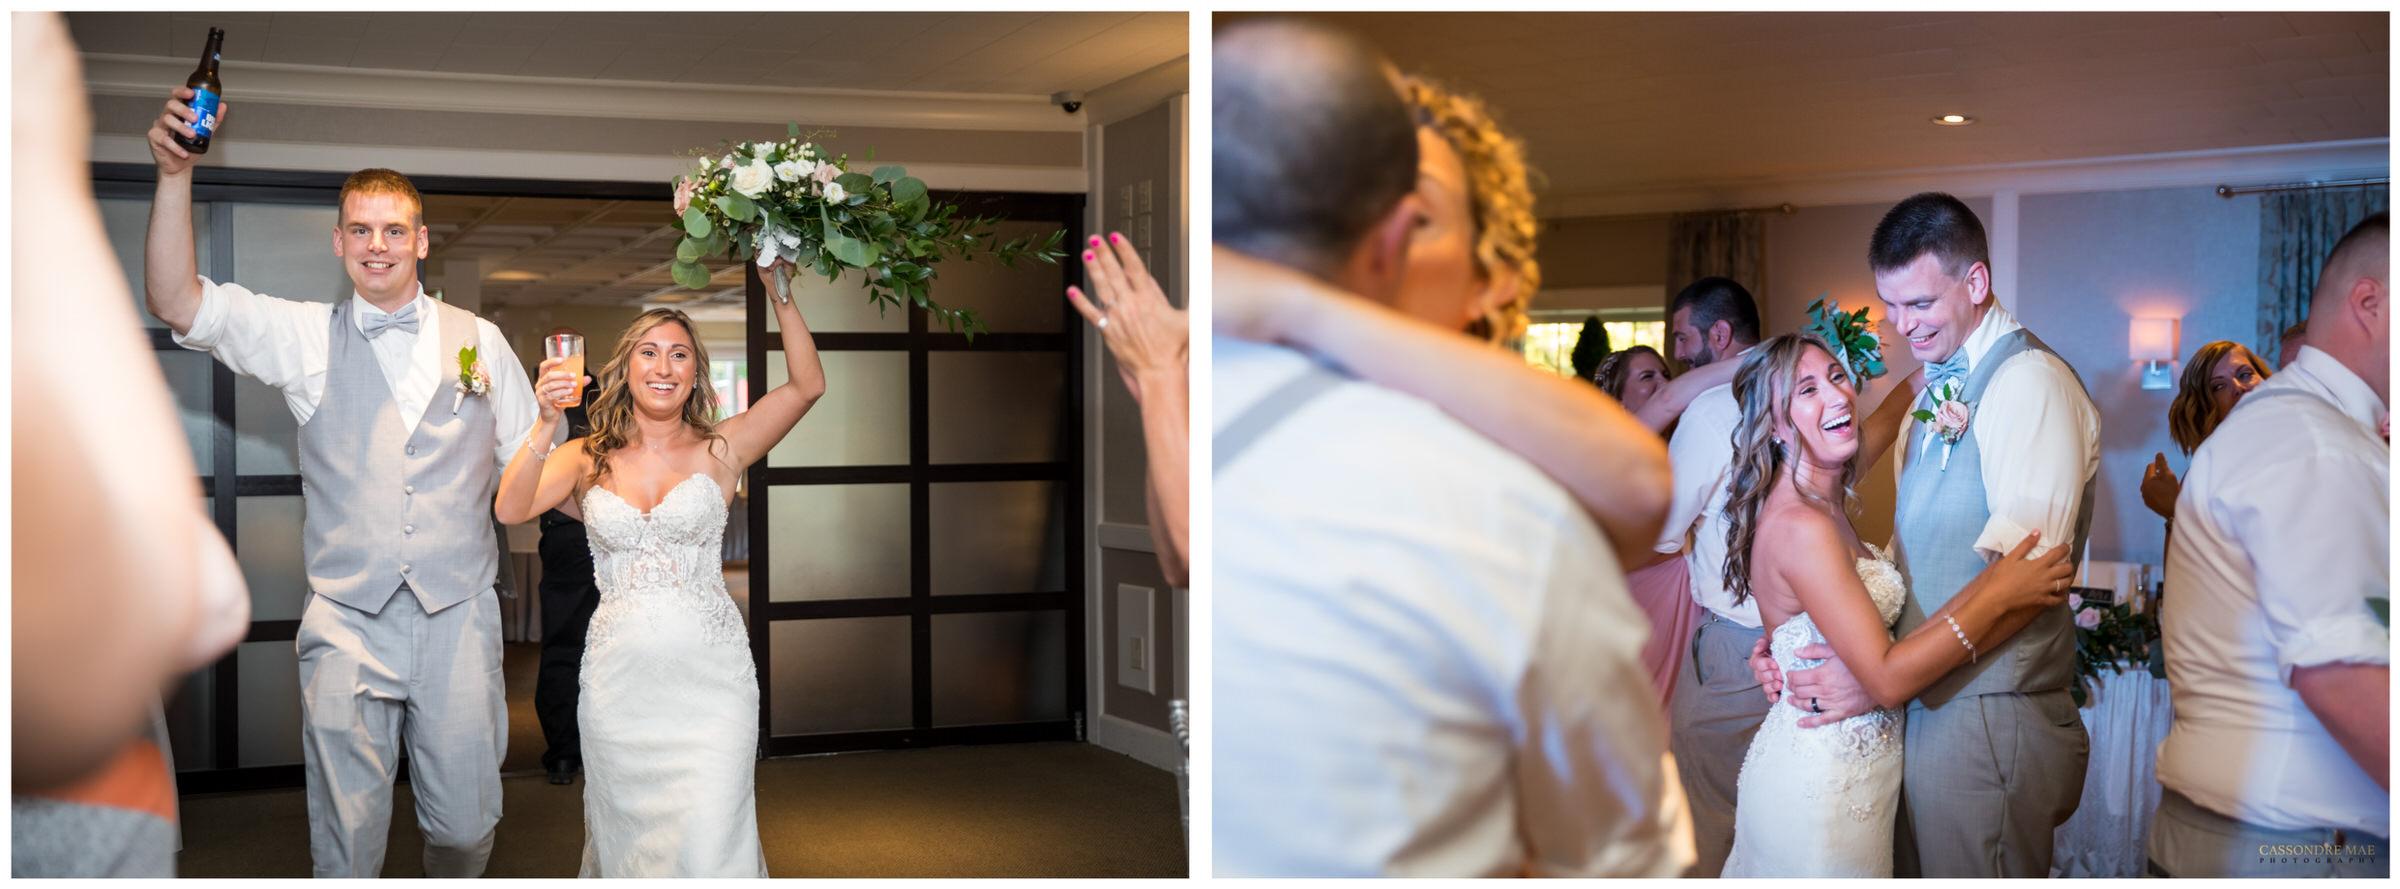 Cassondre Mae Photography Hudson Valley Wedding 31.jpg